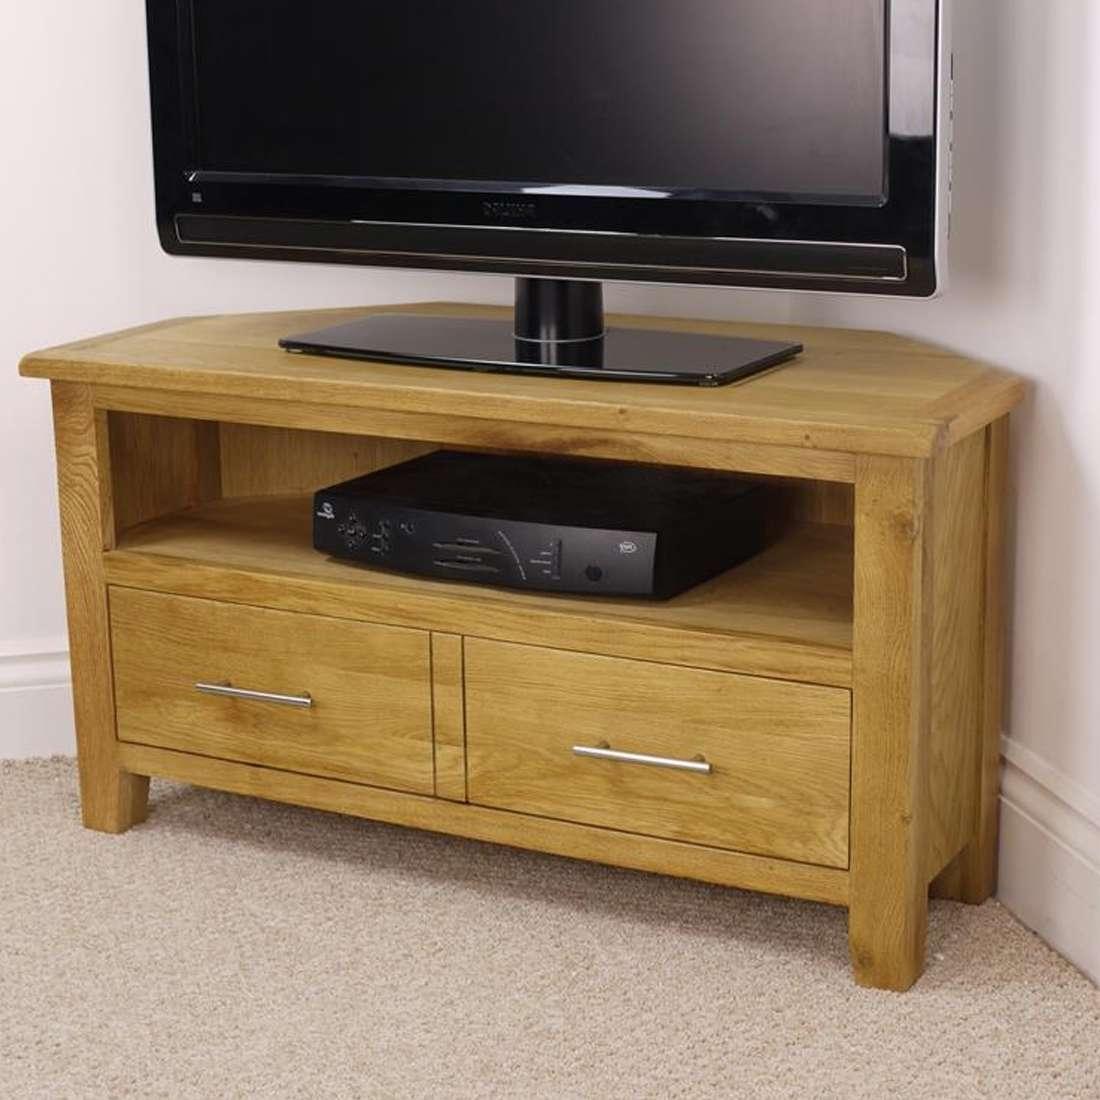 Nebraska Modern Oak Corner Tv Unit / Solid Wood Tv Stand / Oiled Pertaining To Wood Corner Tv Cabinets (View 3 of 20)